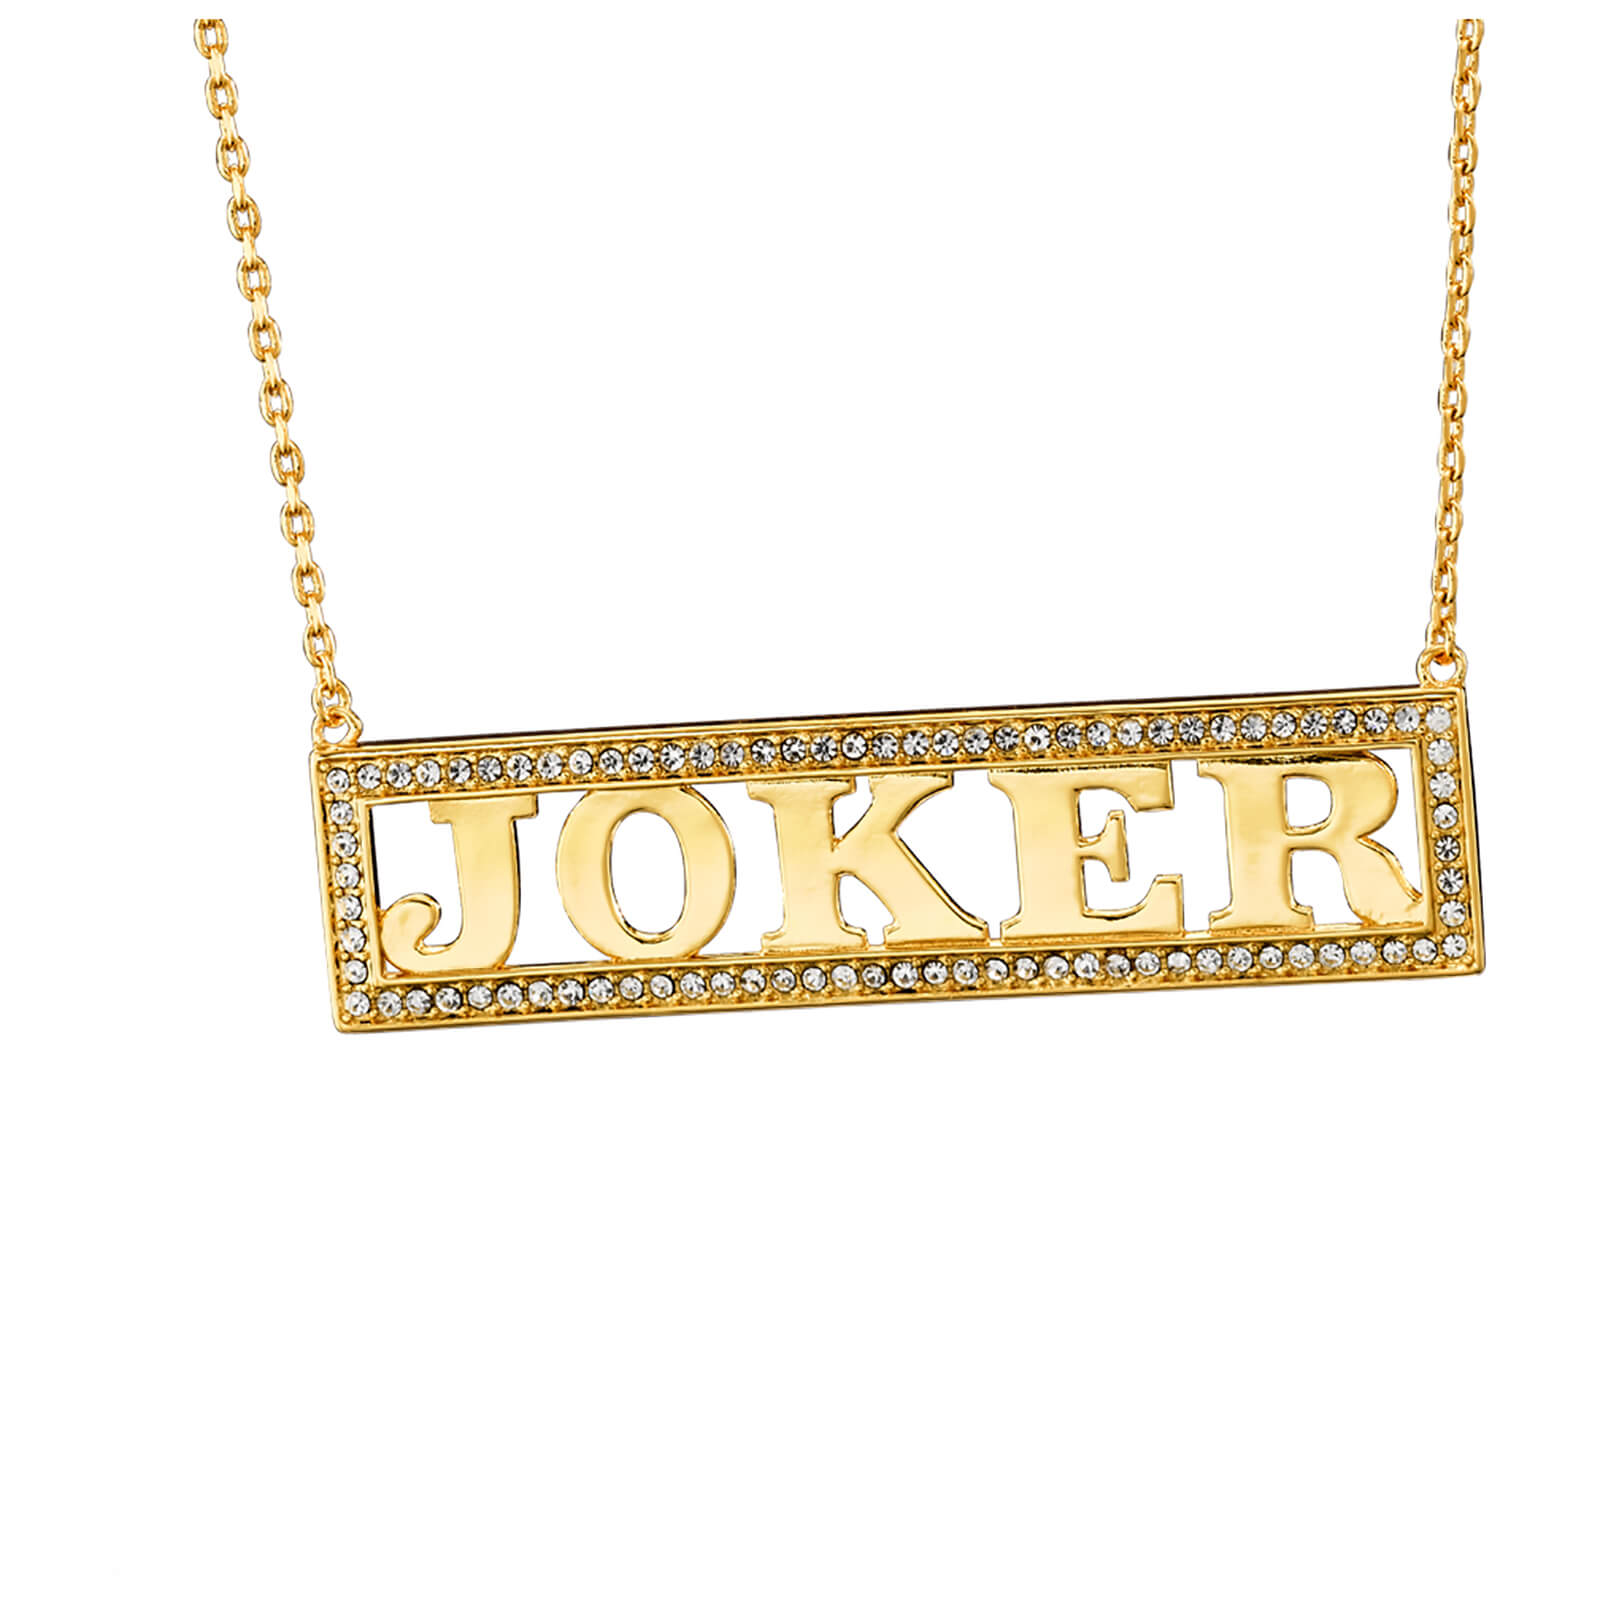 Image of DC Comics Suicide Squad Harley Quinn's Joker Necklace